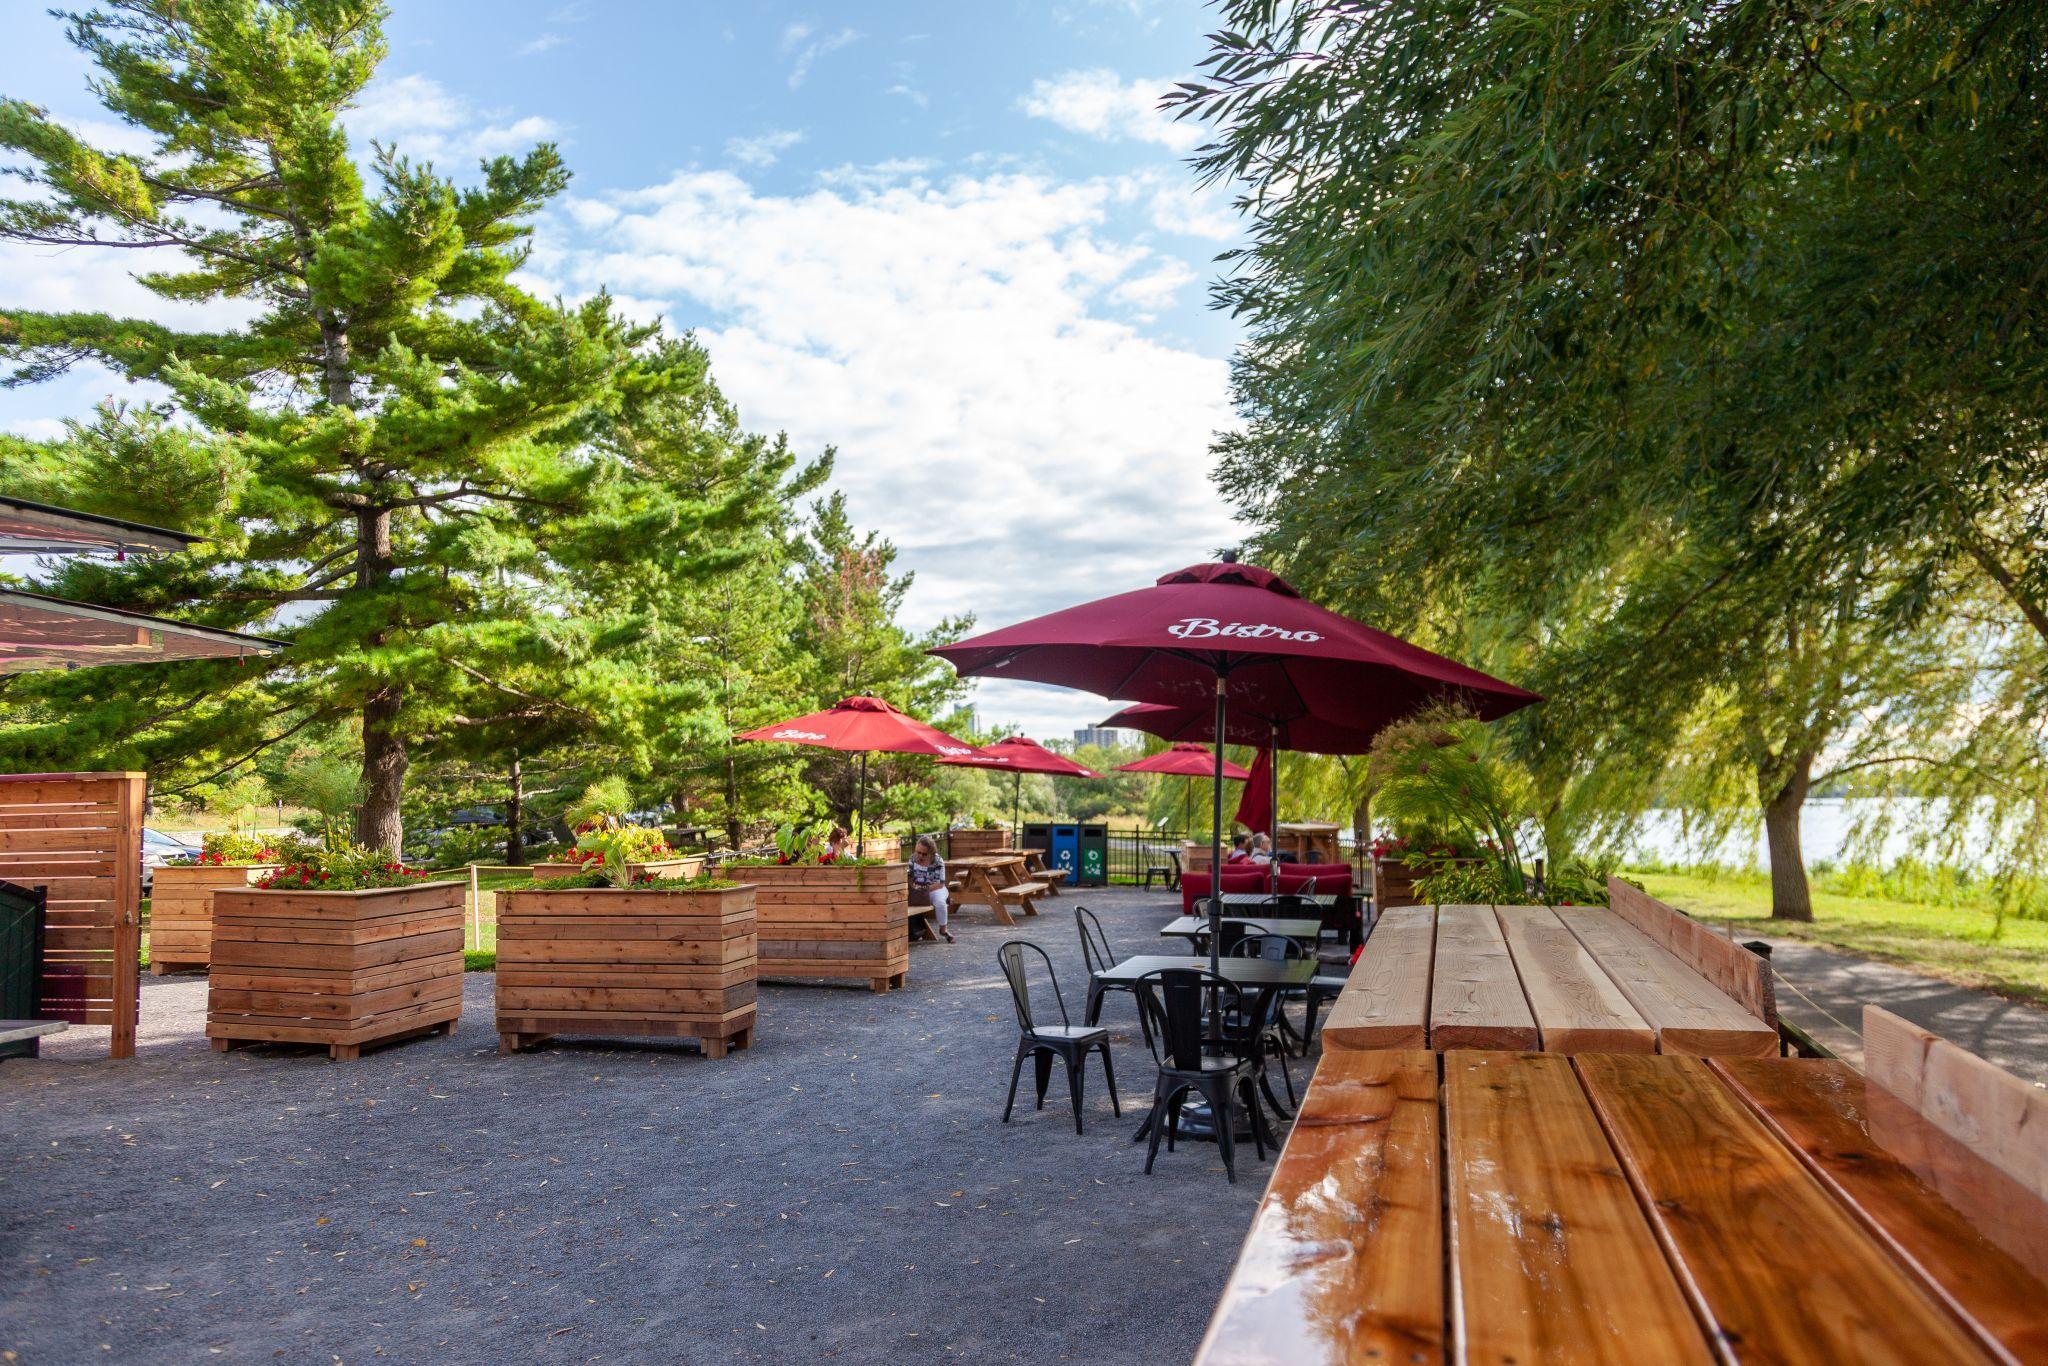 Bistro patio at Remic Rapids Park.